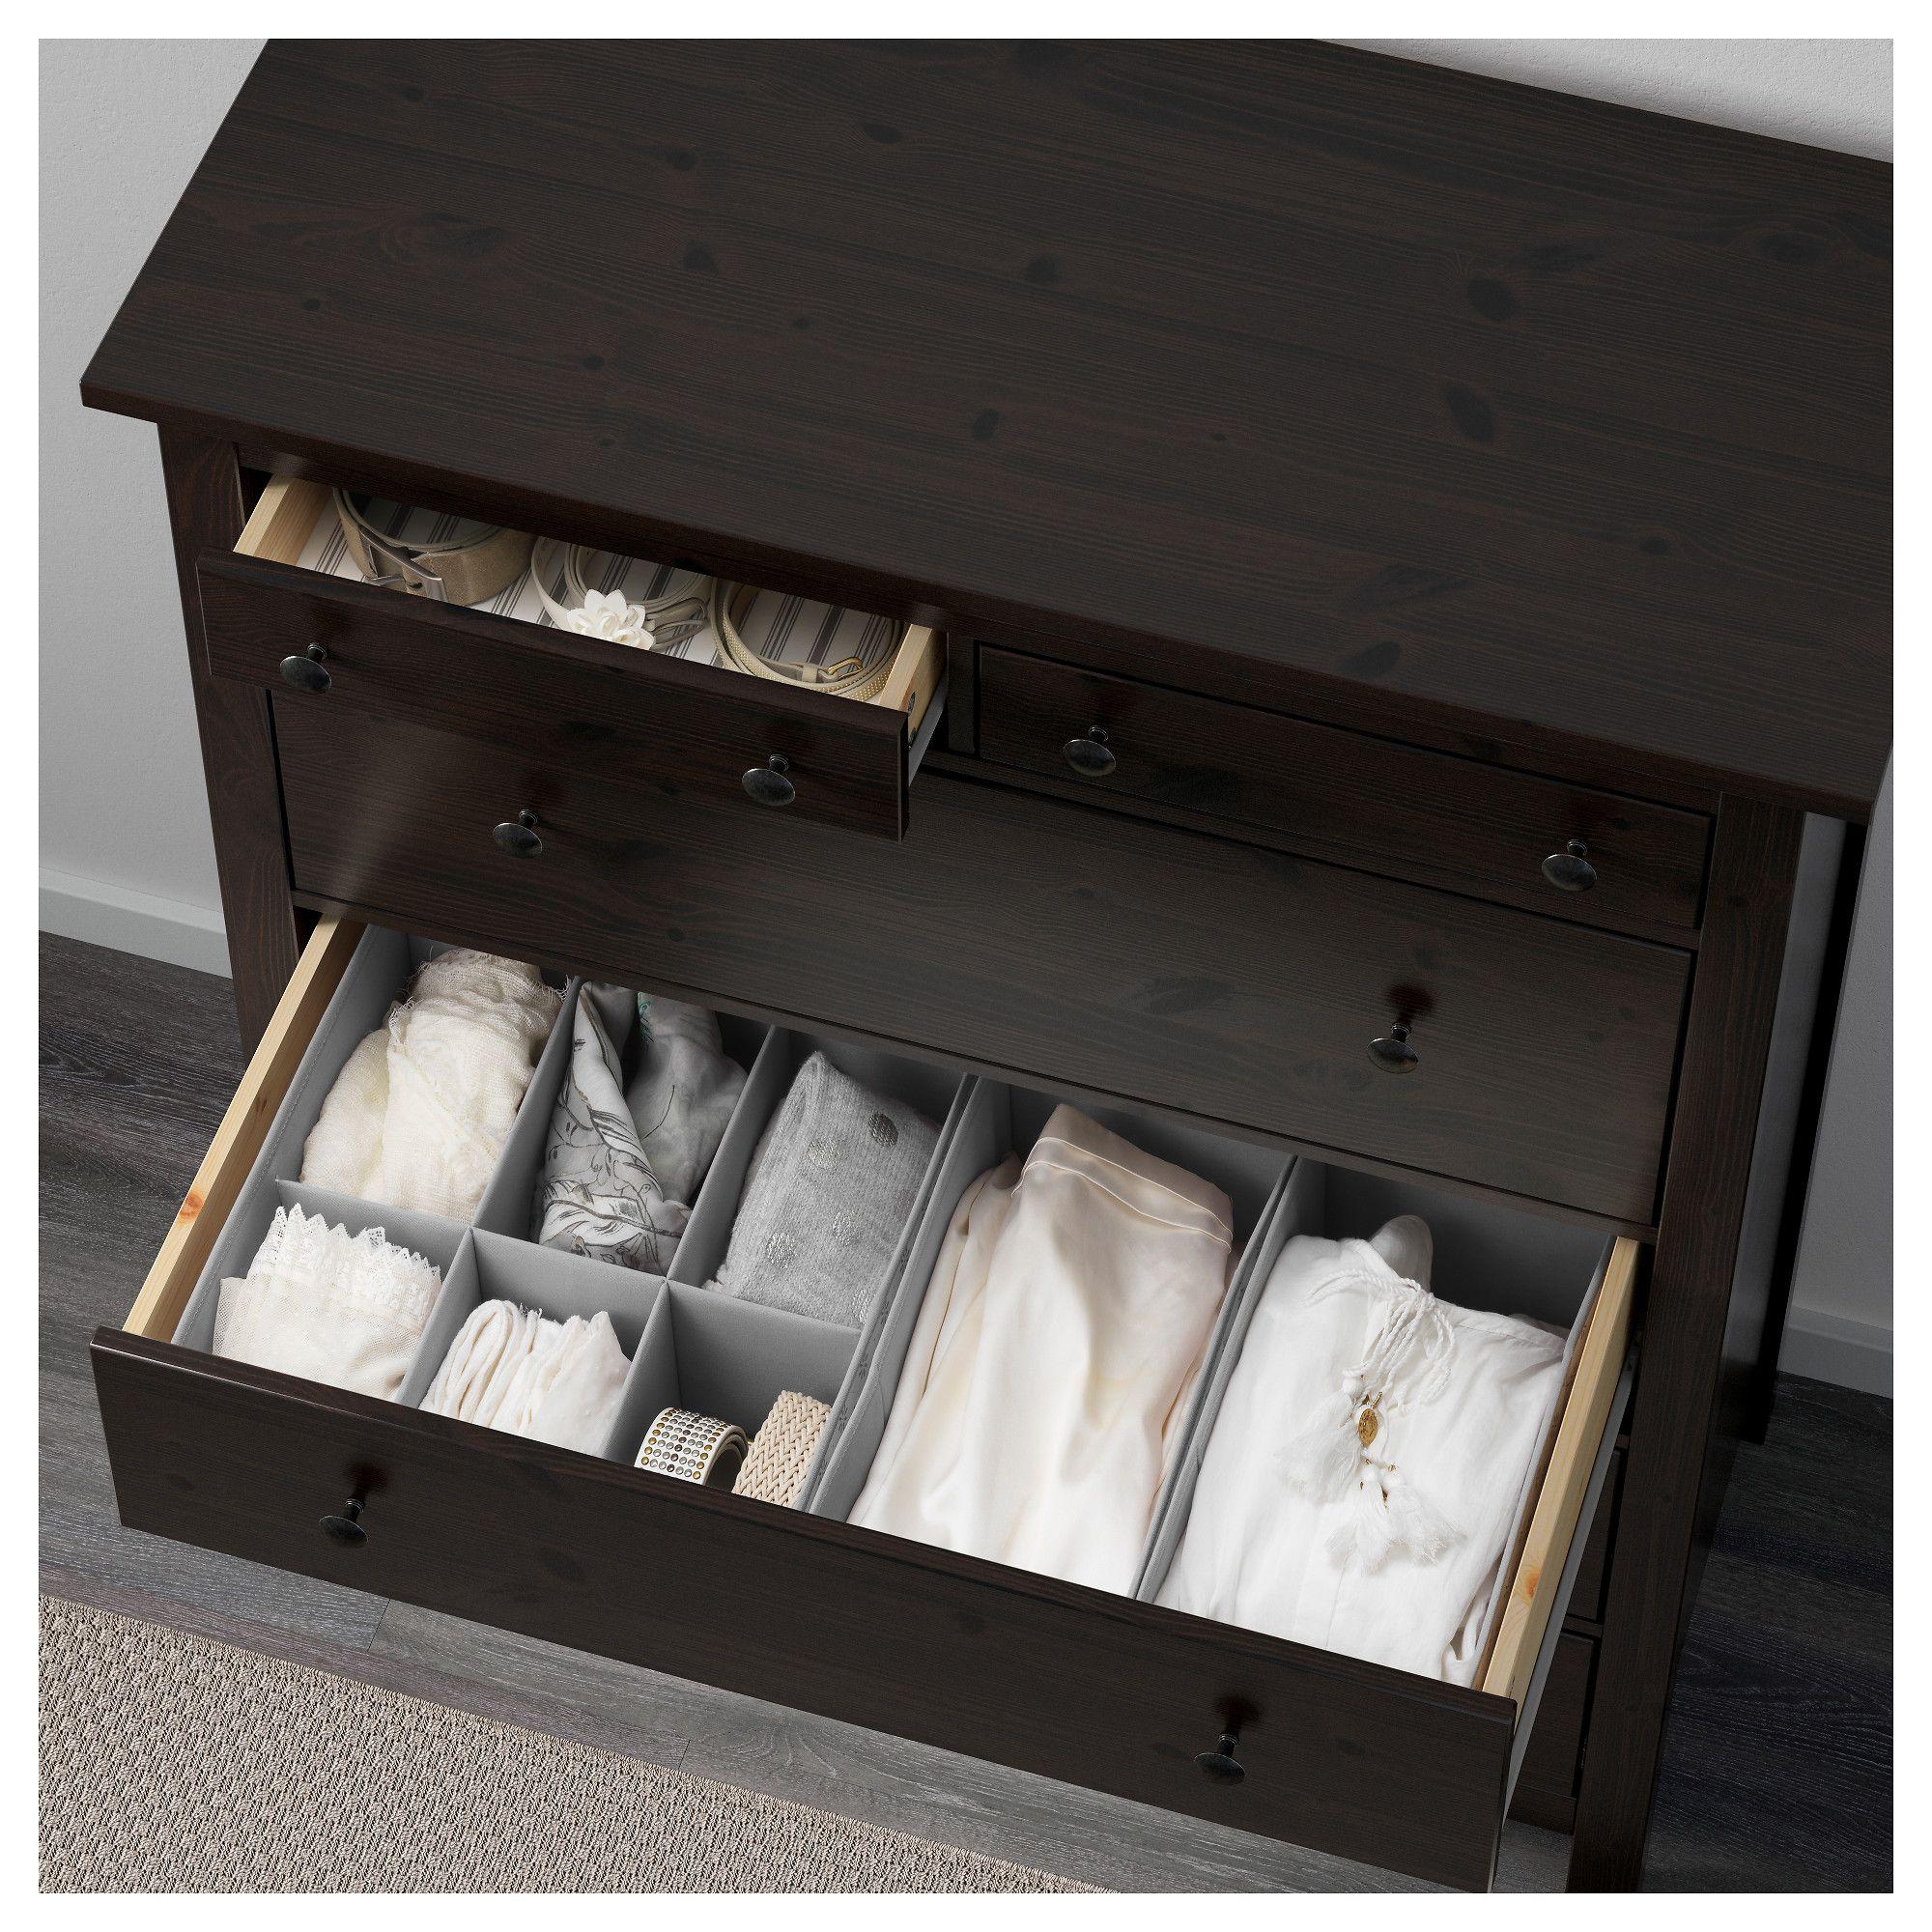 Ikea Hemnes 6 Drawer Chest Black Brown